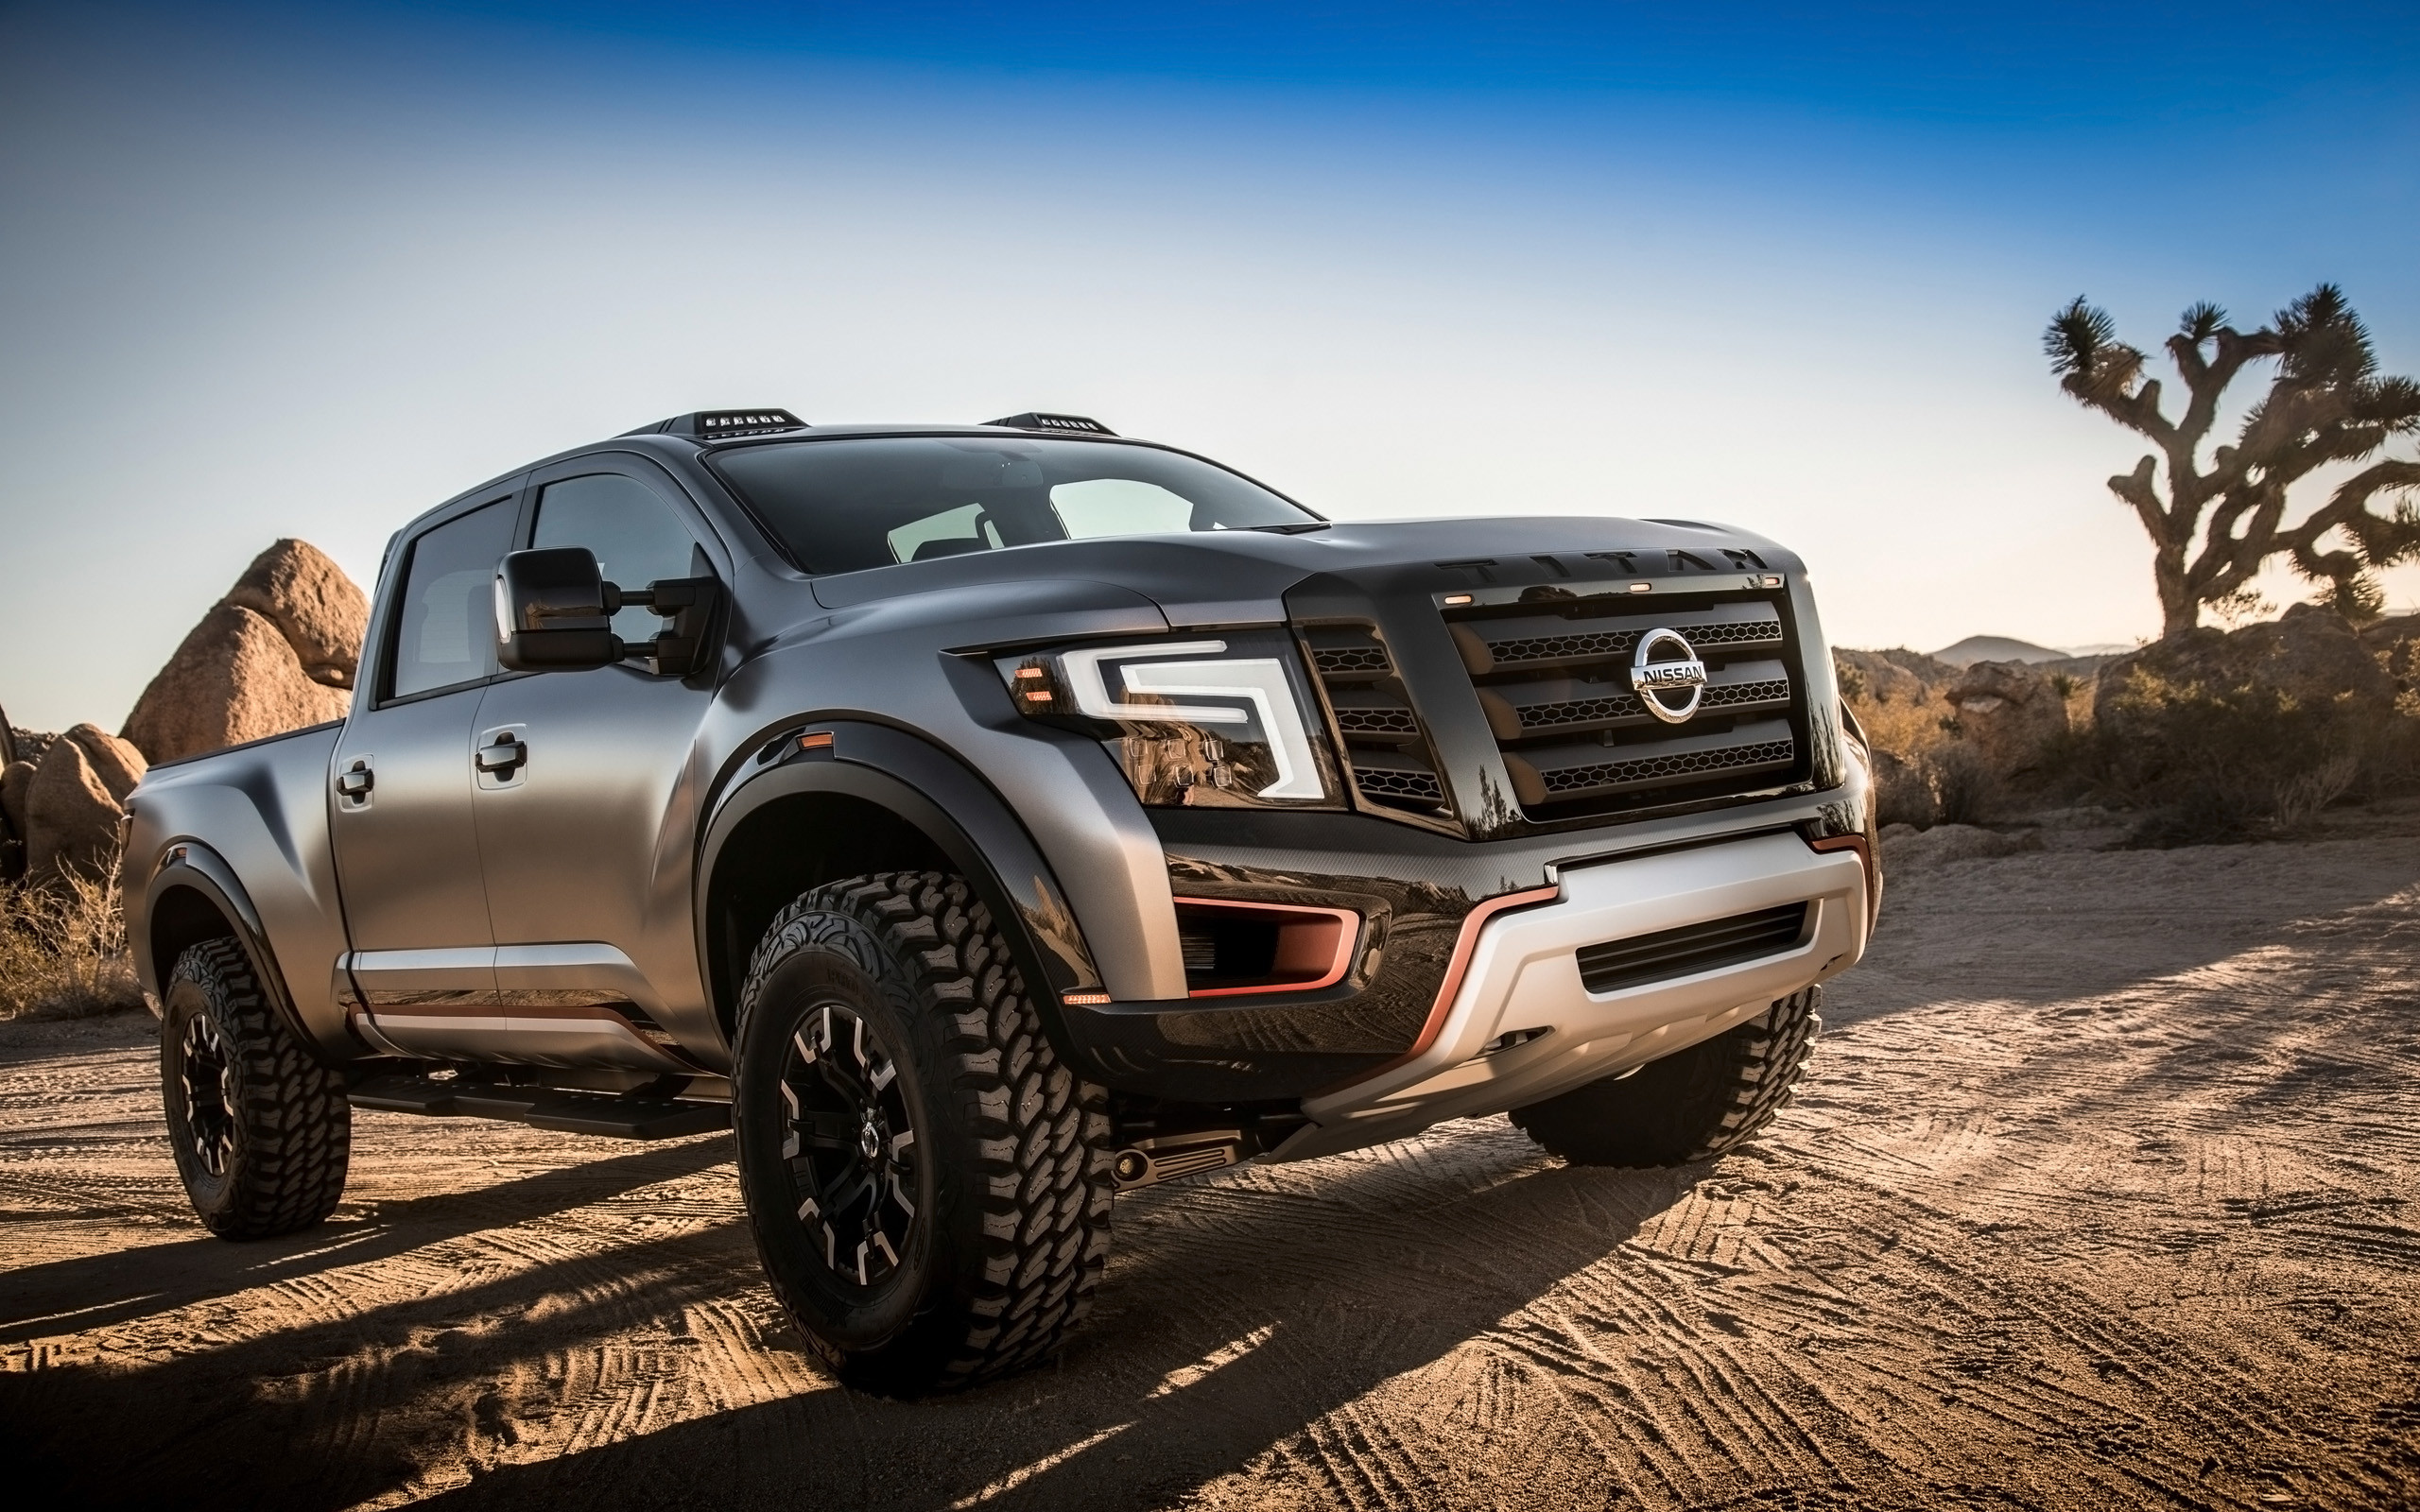 2016 Nissan Titan Warrior Concept